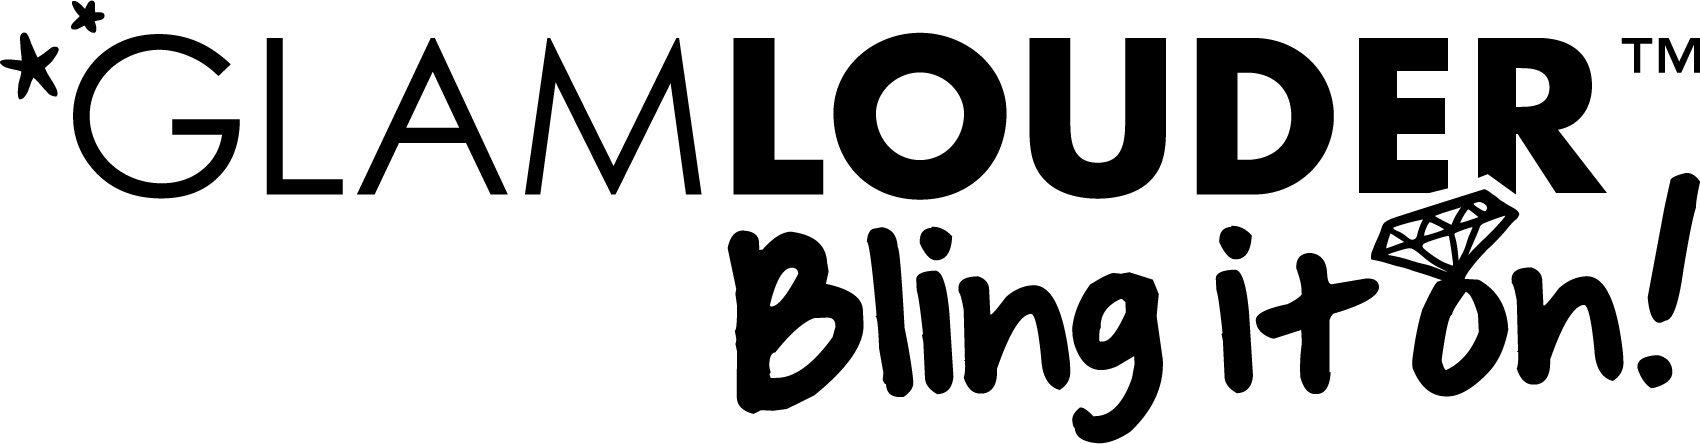 Bling It On Glam Hpnotiq Logo Version 3